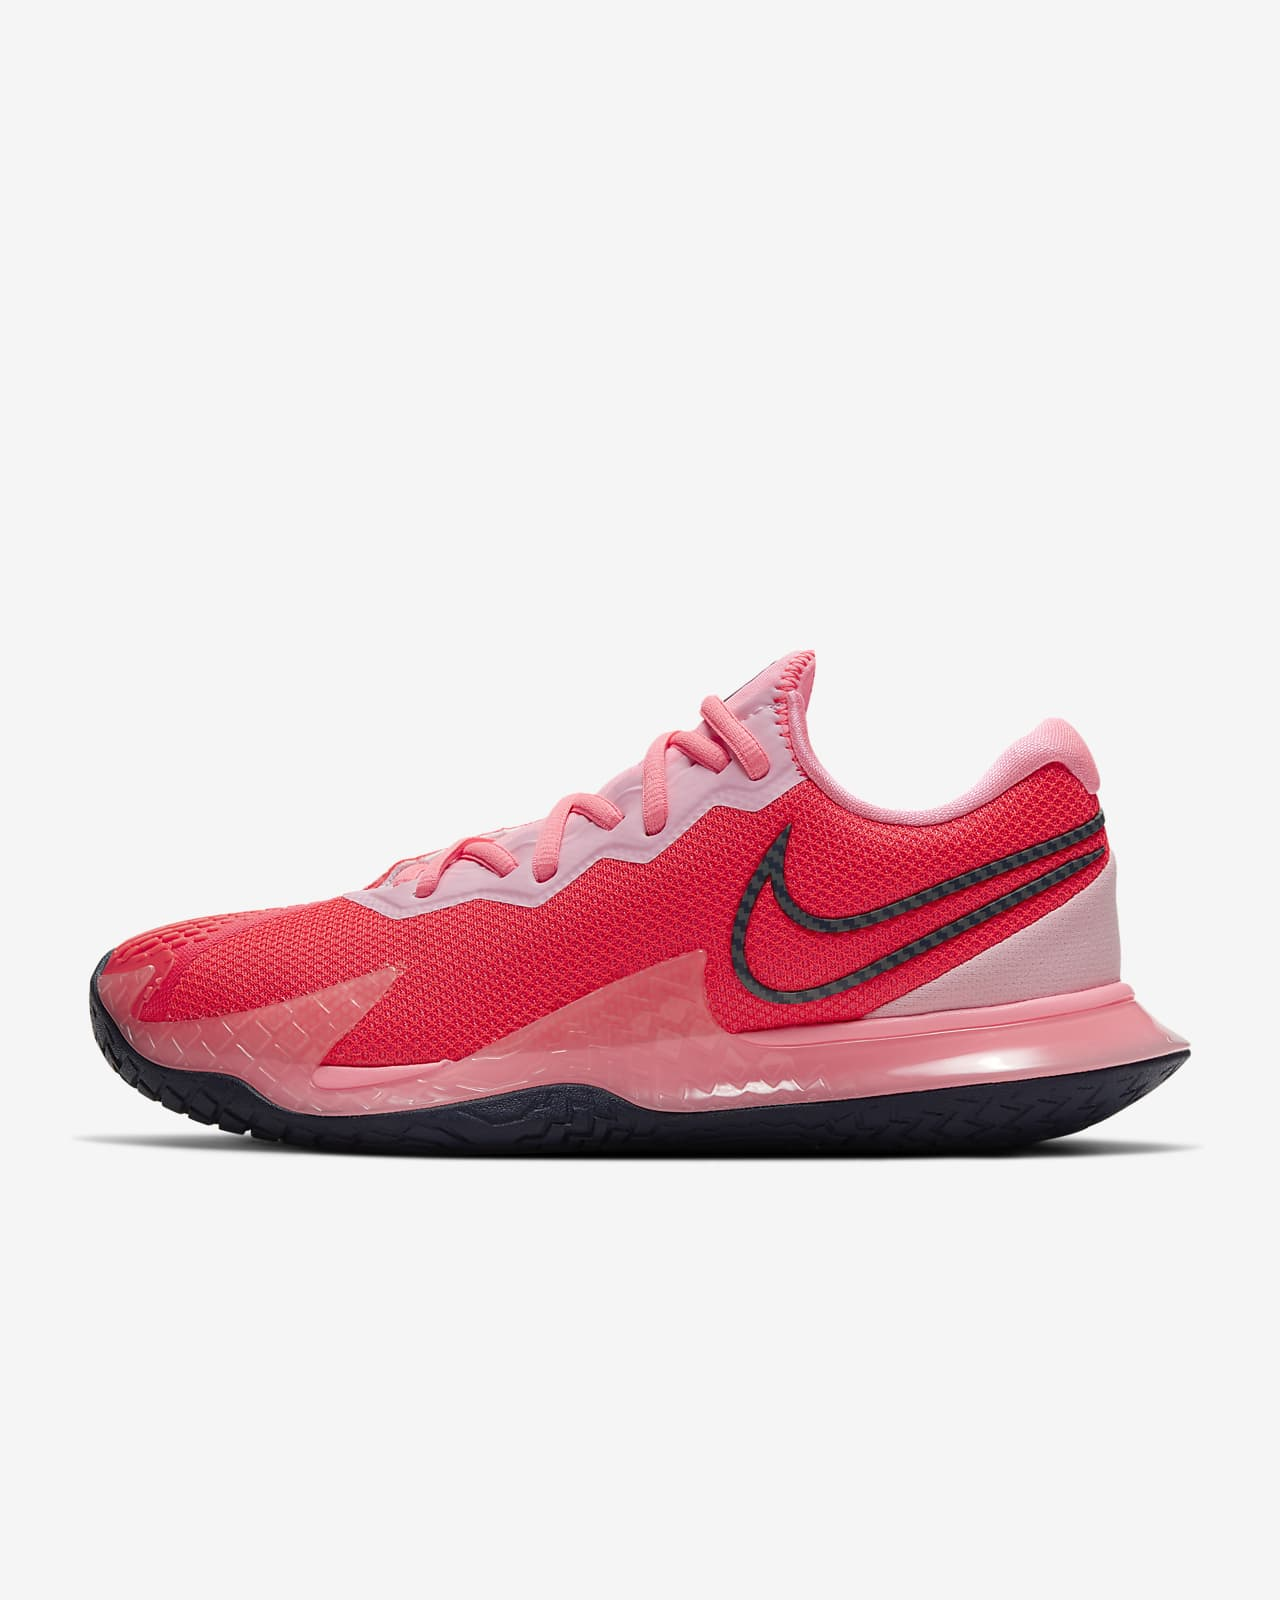 NikeCourt Air Zoom Vapor Cage 4 Women's